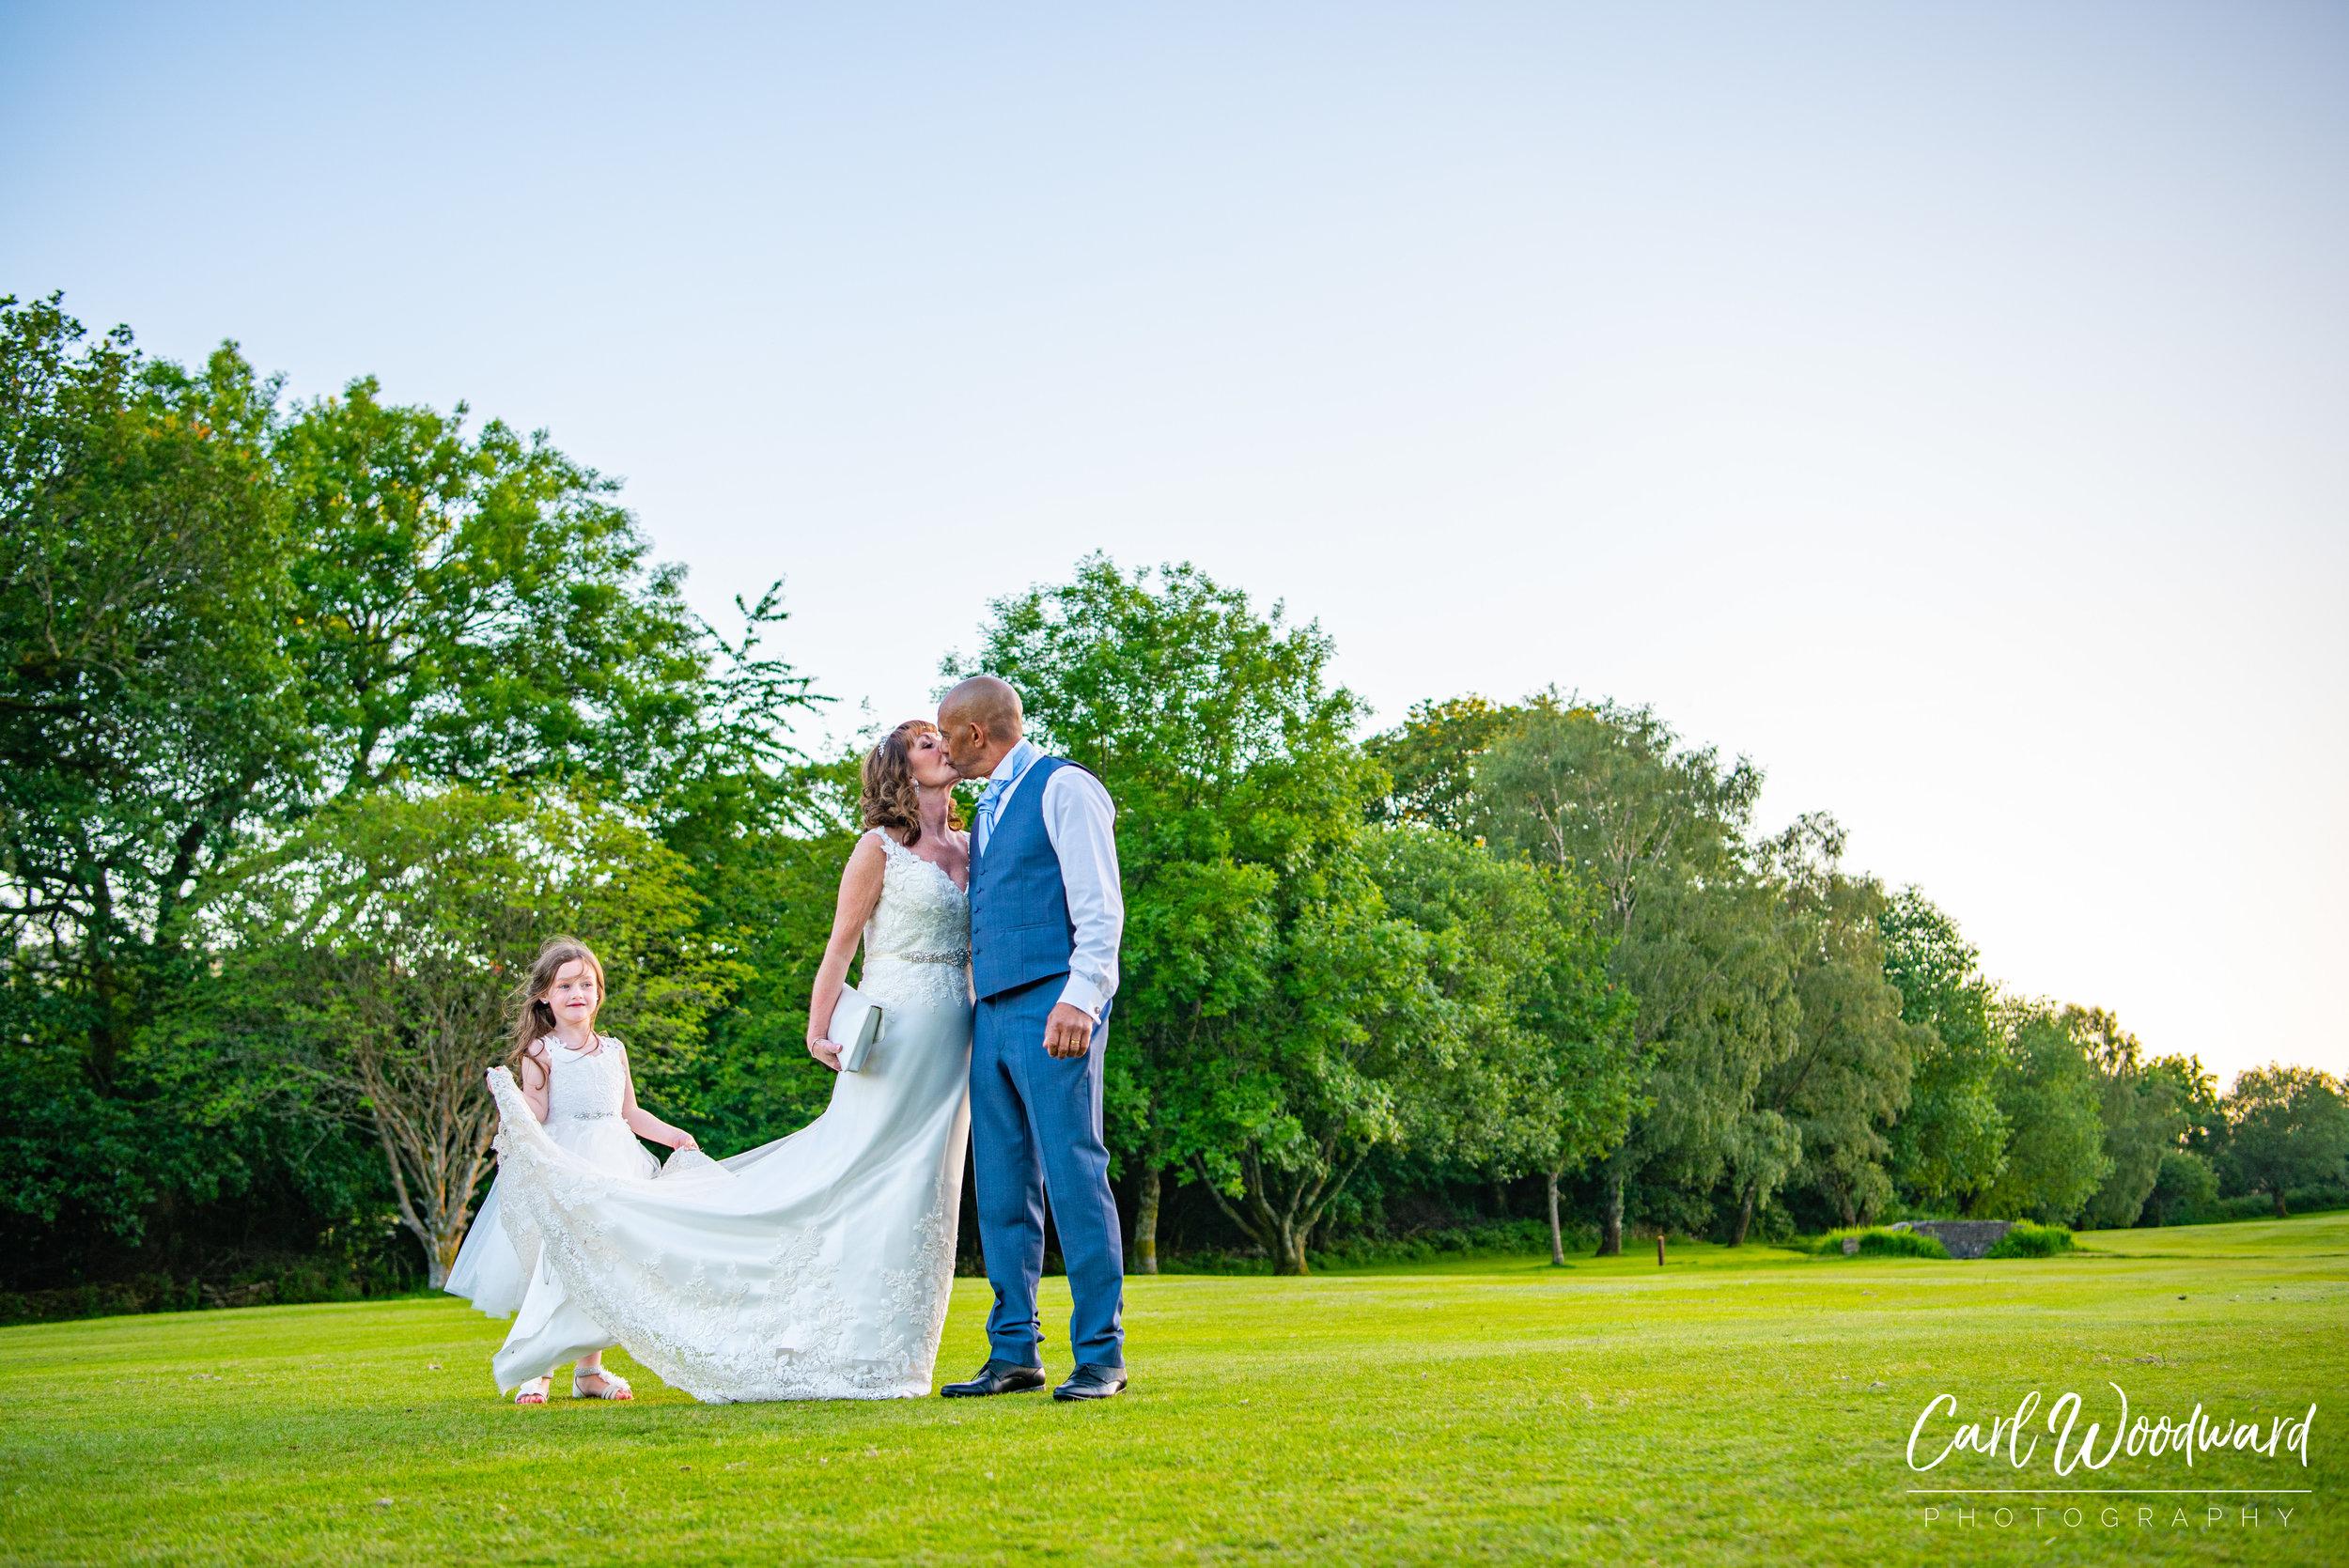 018-Mountain-Ash-Golf-Club-Wedding-Photography-Cardiff-Wedding-Photographer.jpg